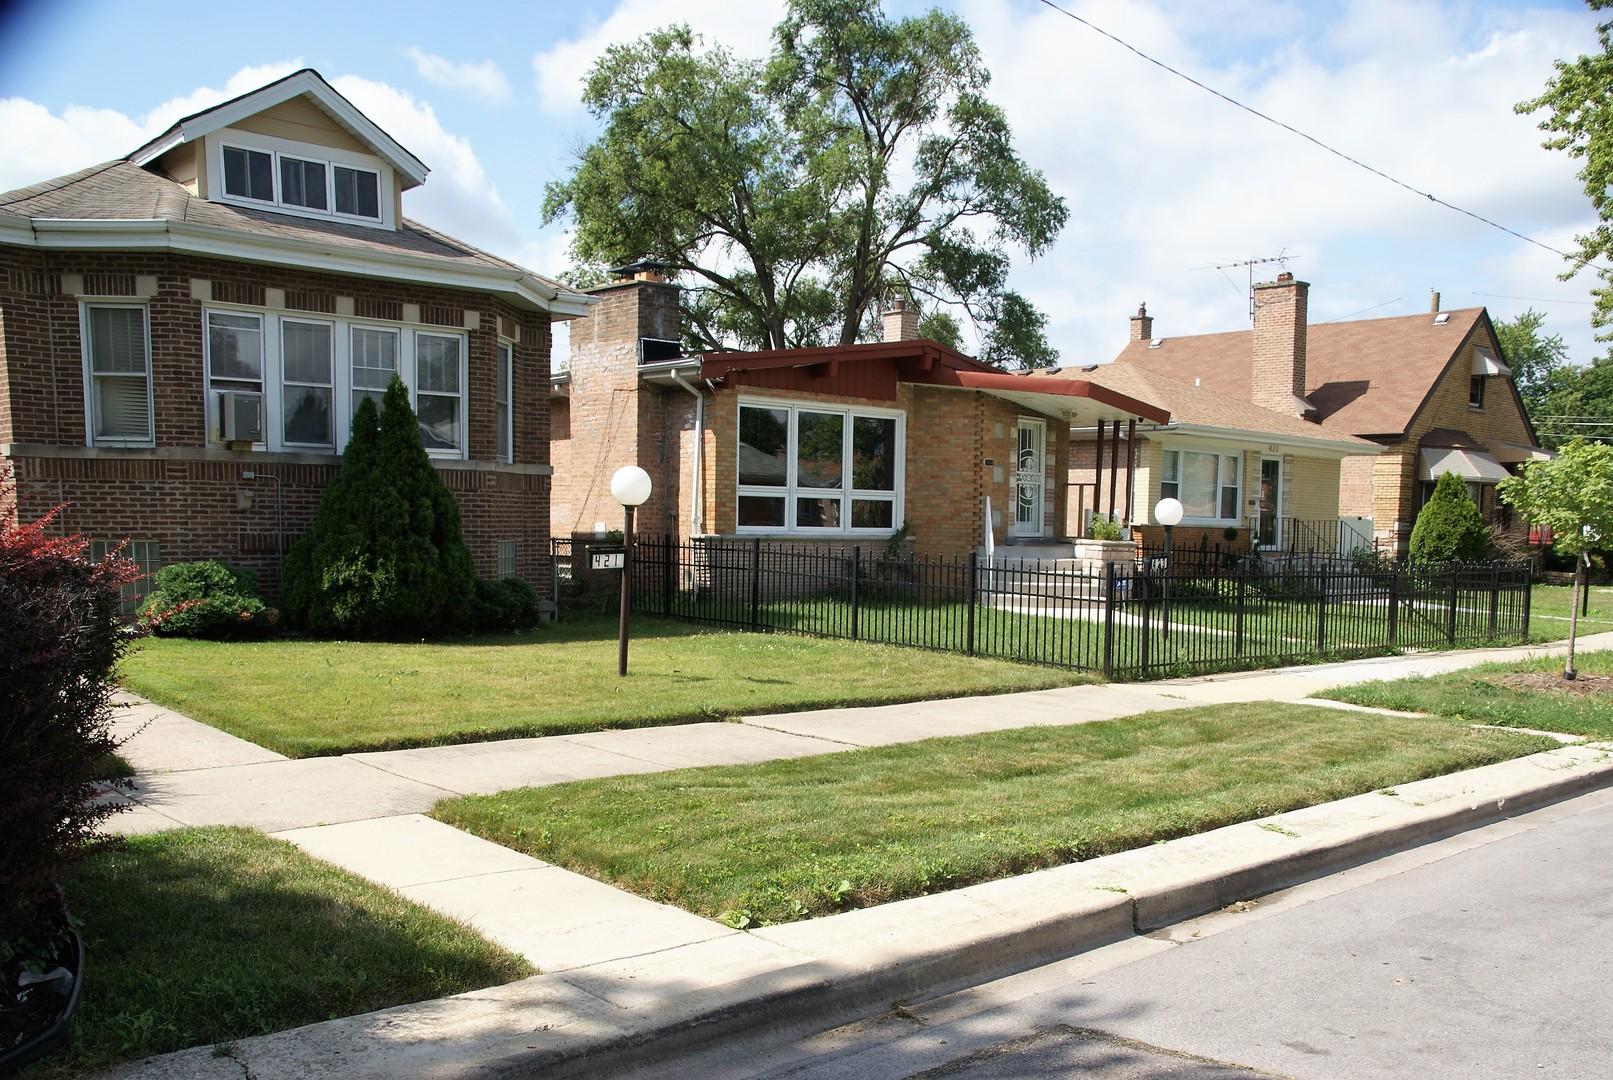 420 West 96TH, CHICAGO, Illinois, 60628